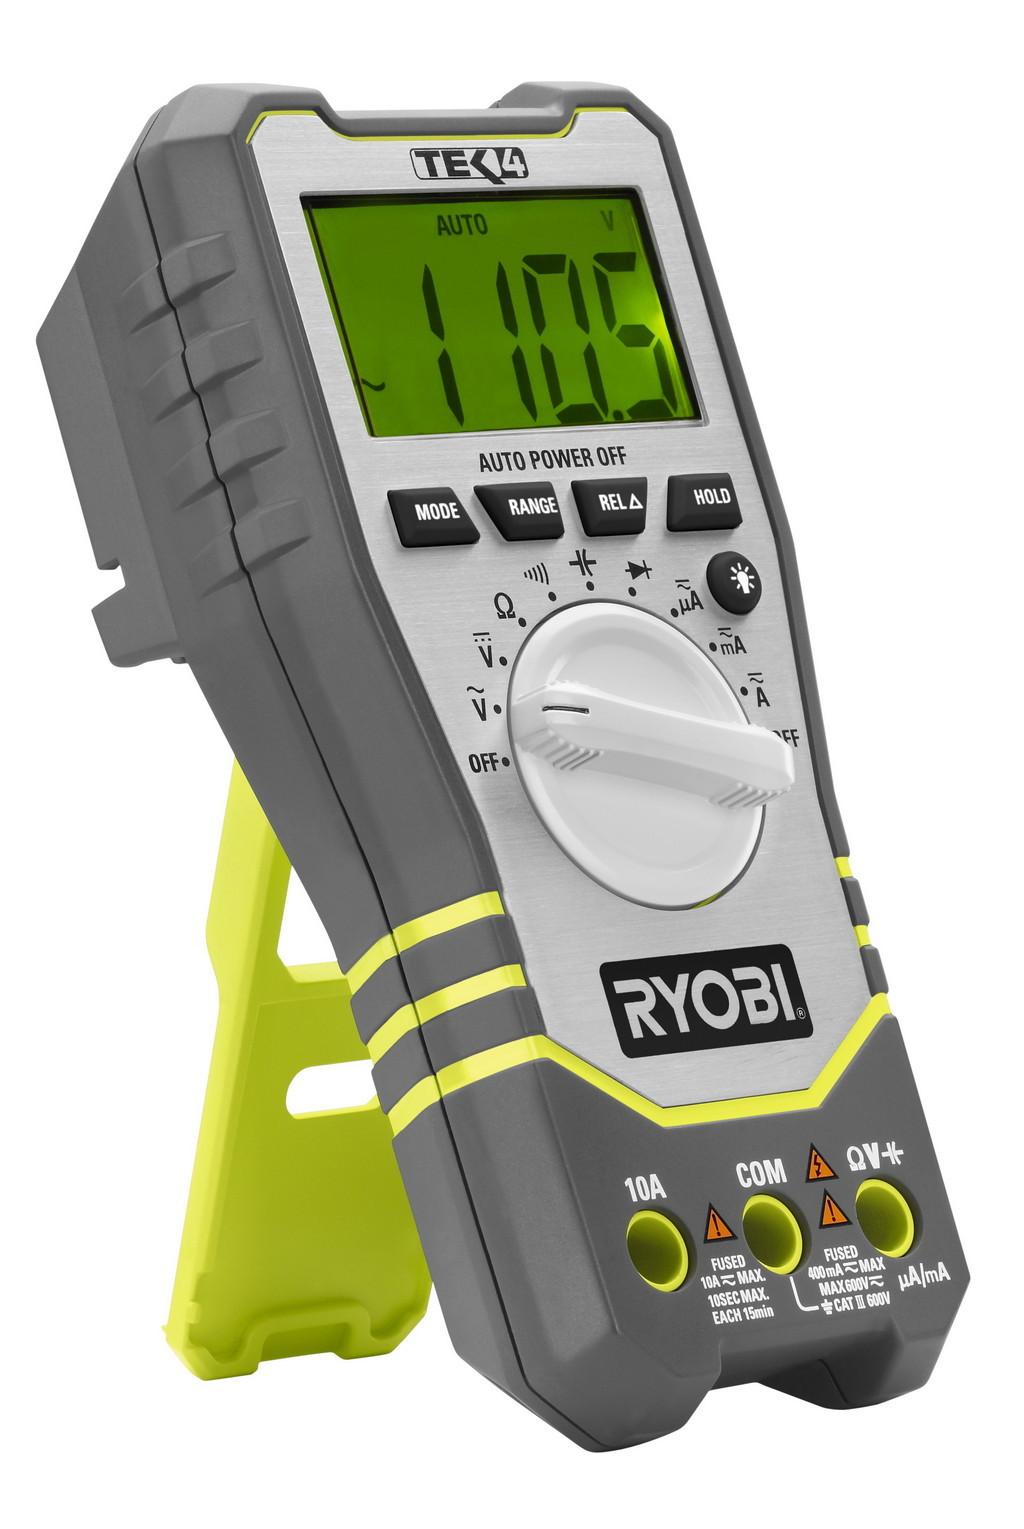 Ryobi RP 4020